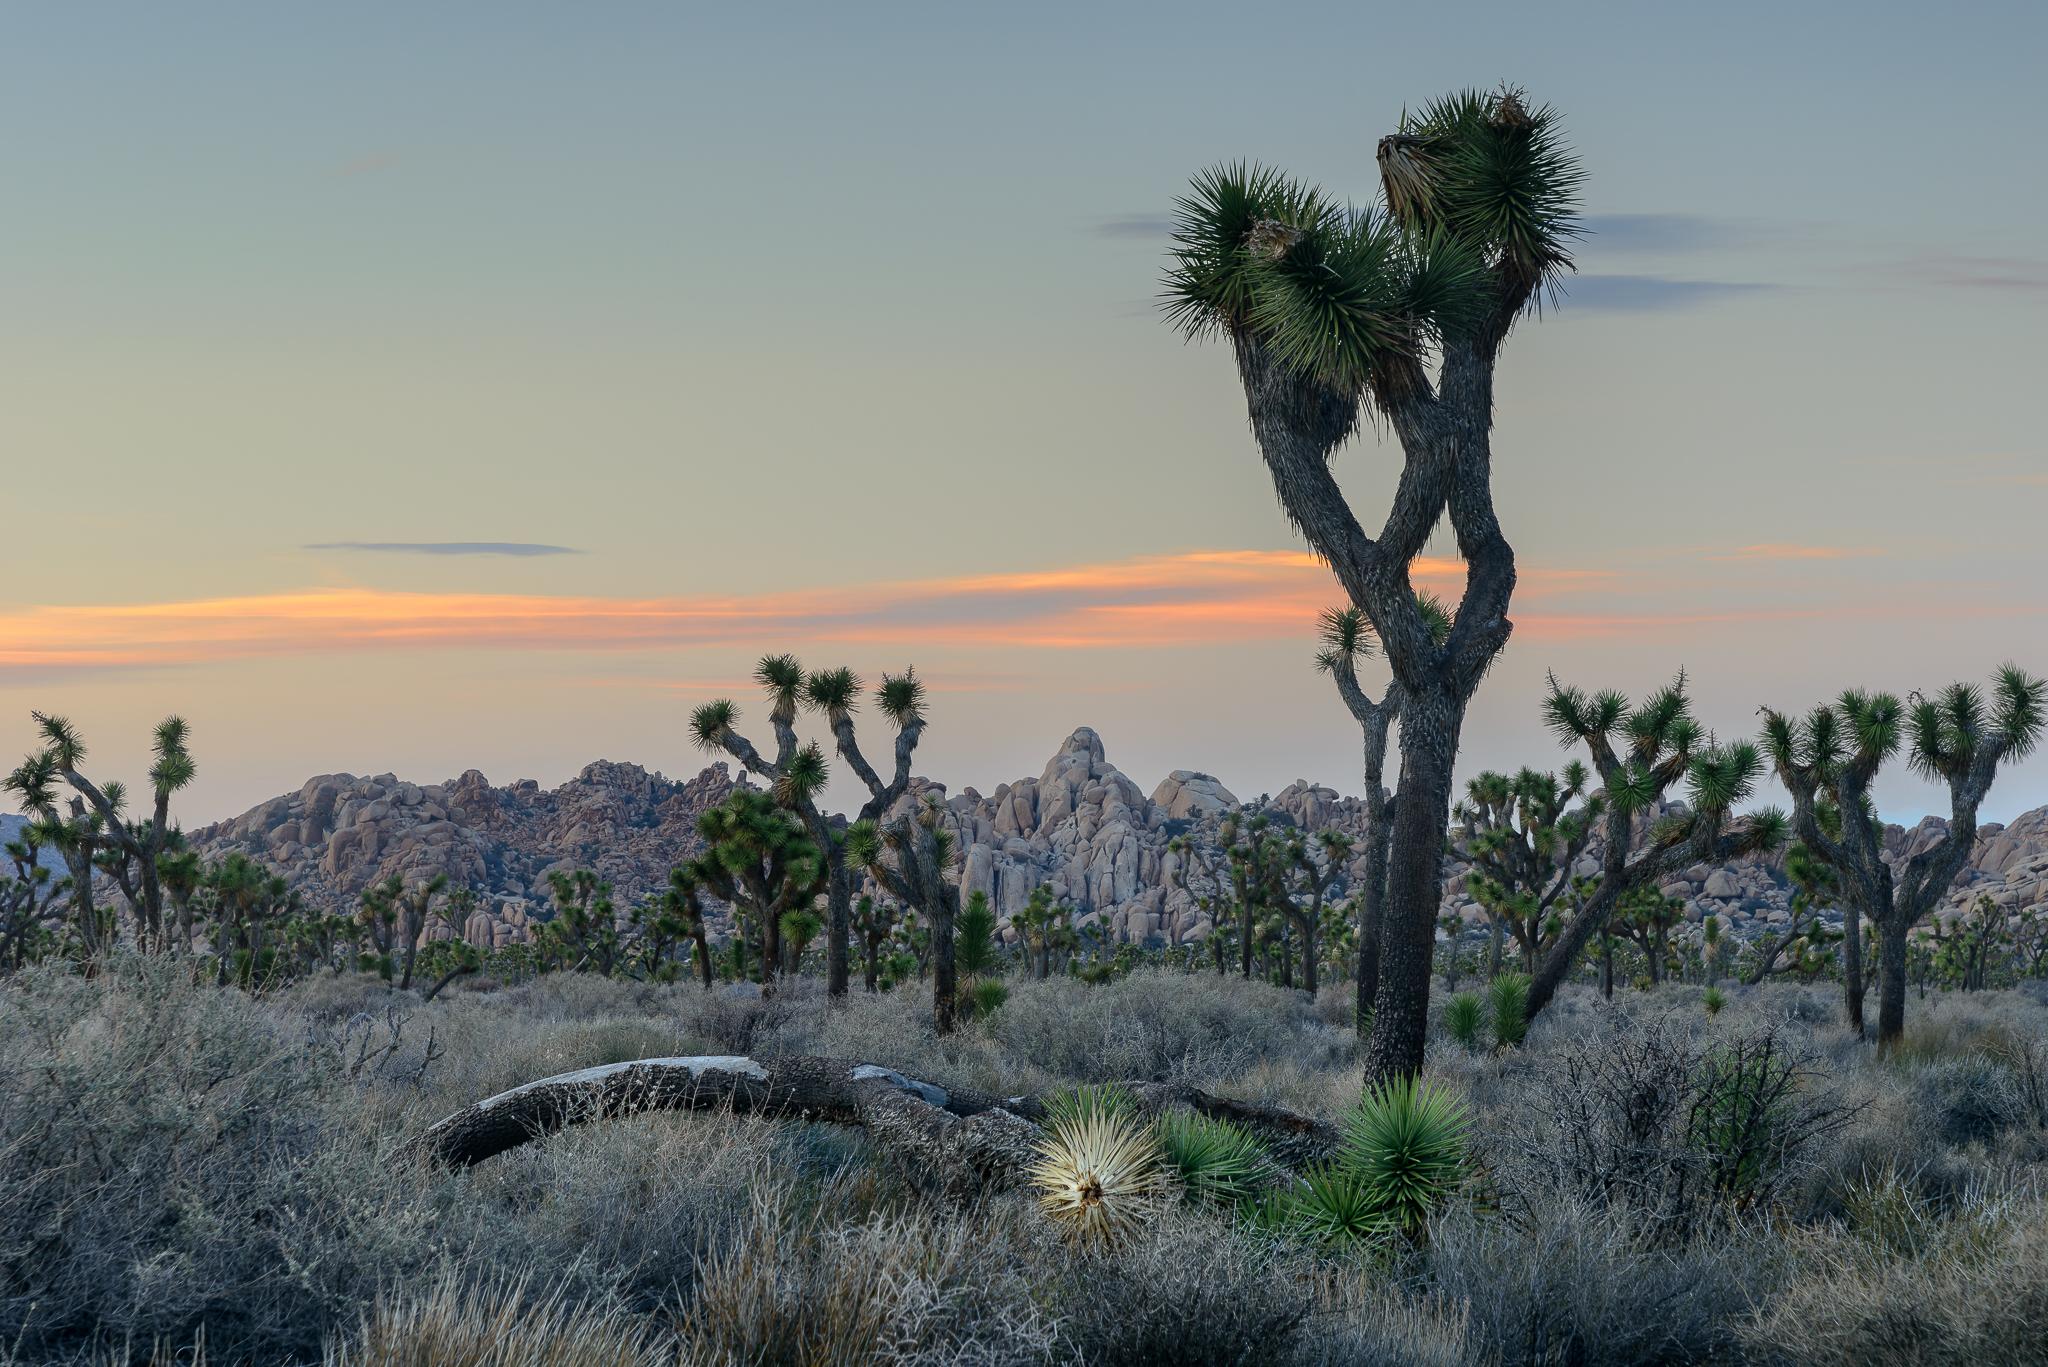 joshua_tree_keys_view_sunset.jpg